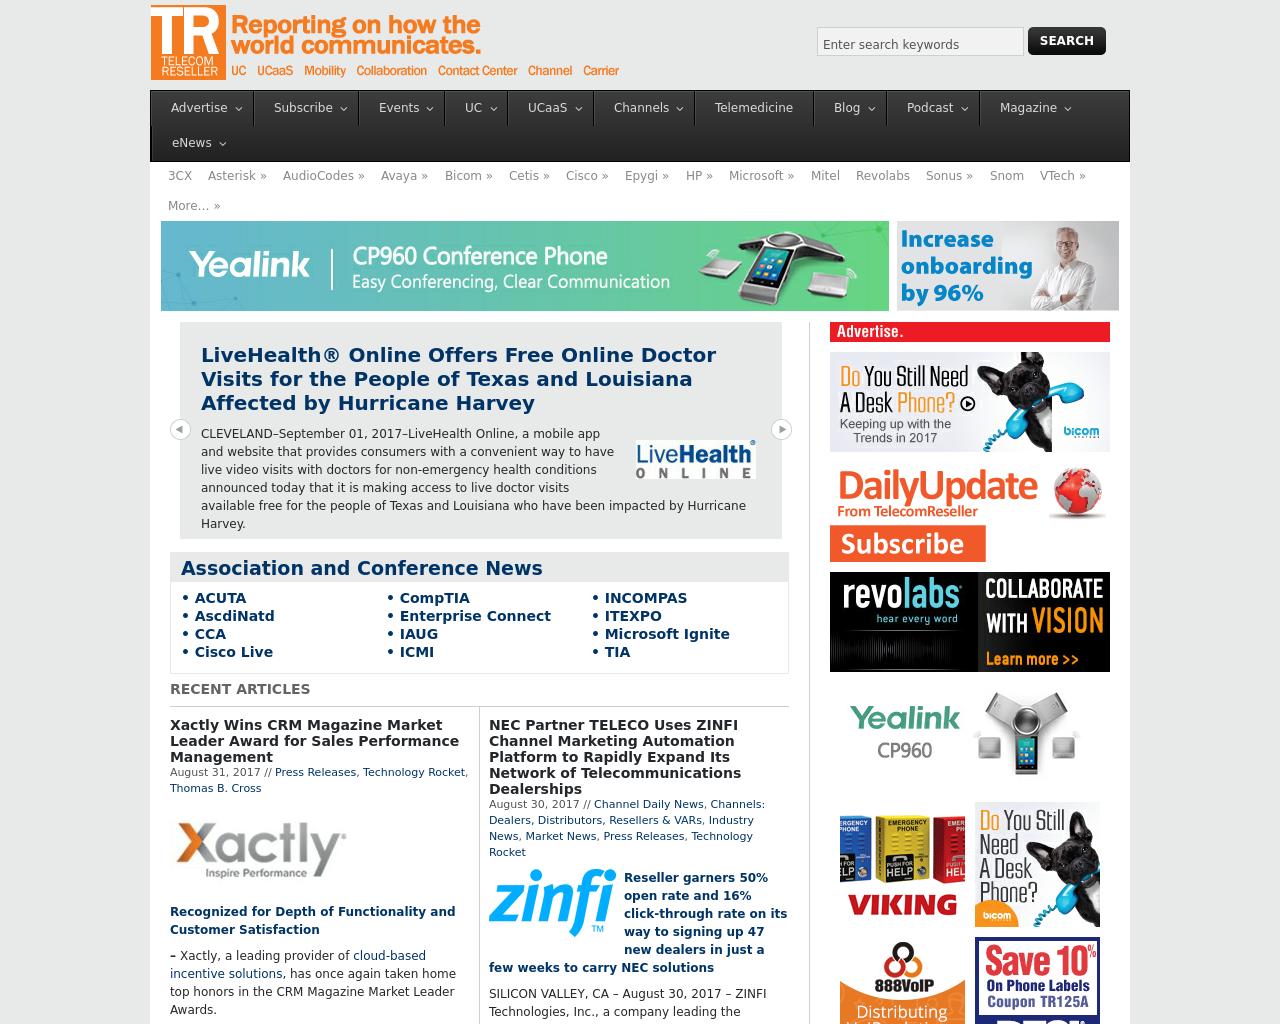 TelecomReseller-Advertising-Reviews-Pricing